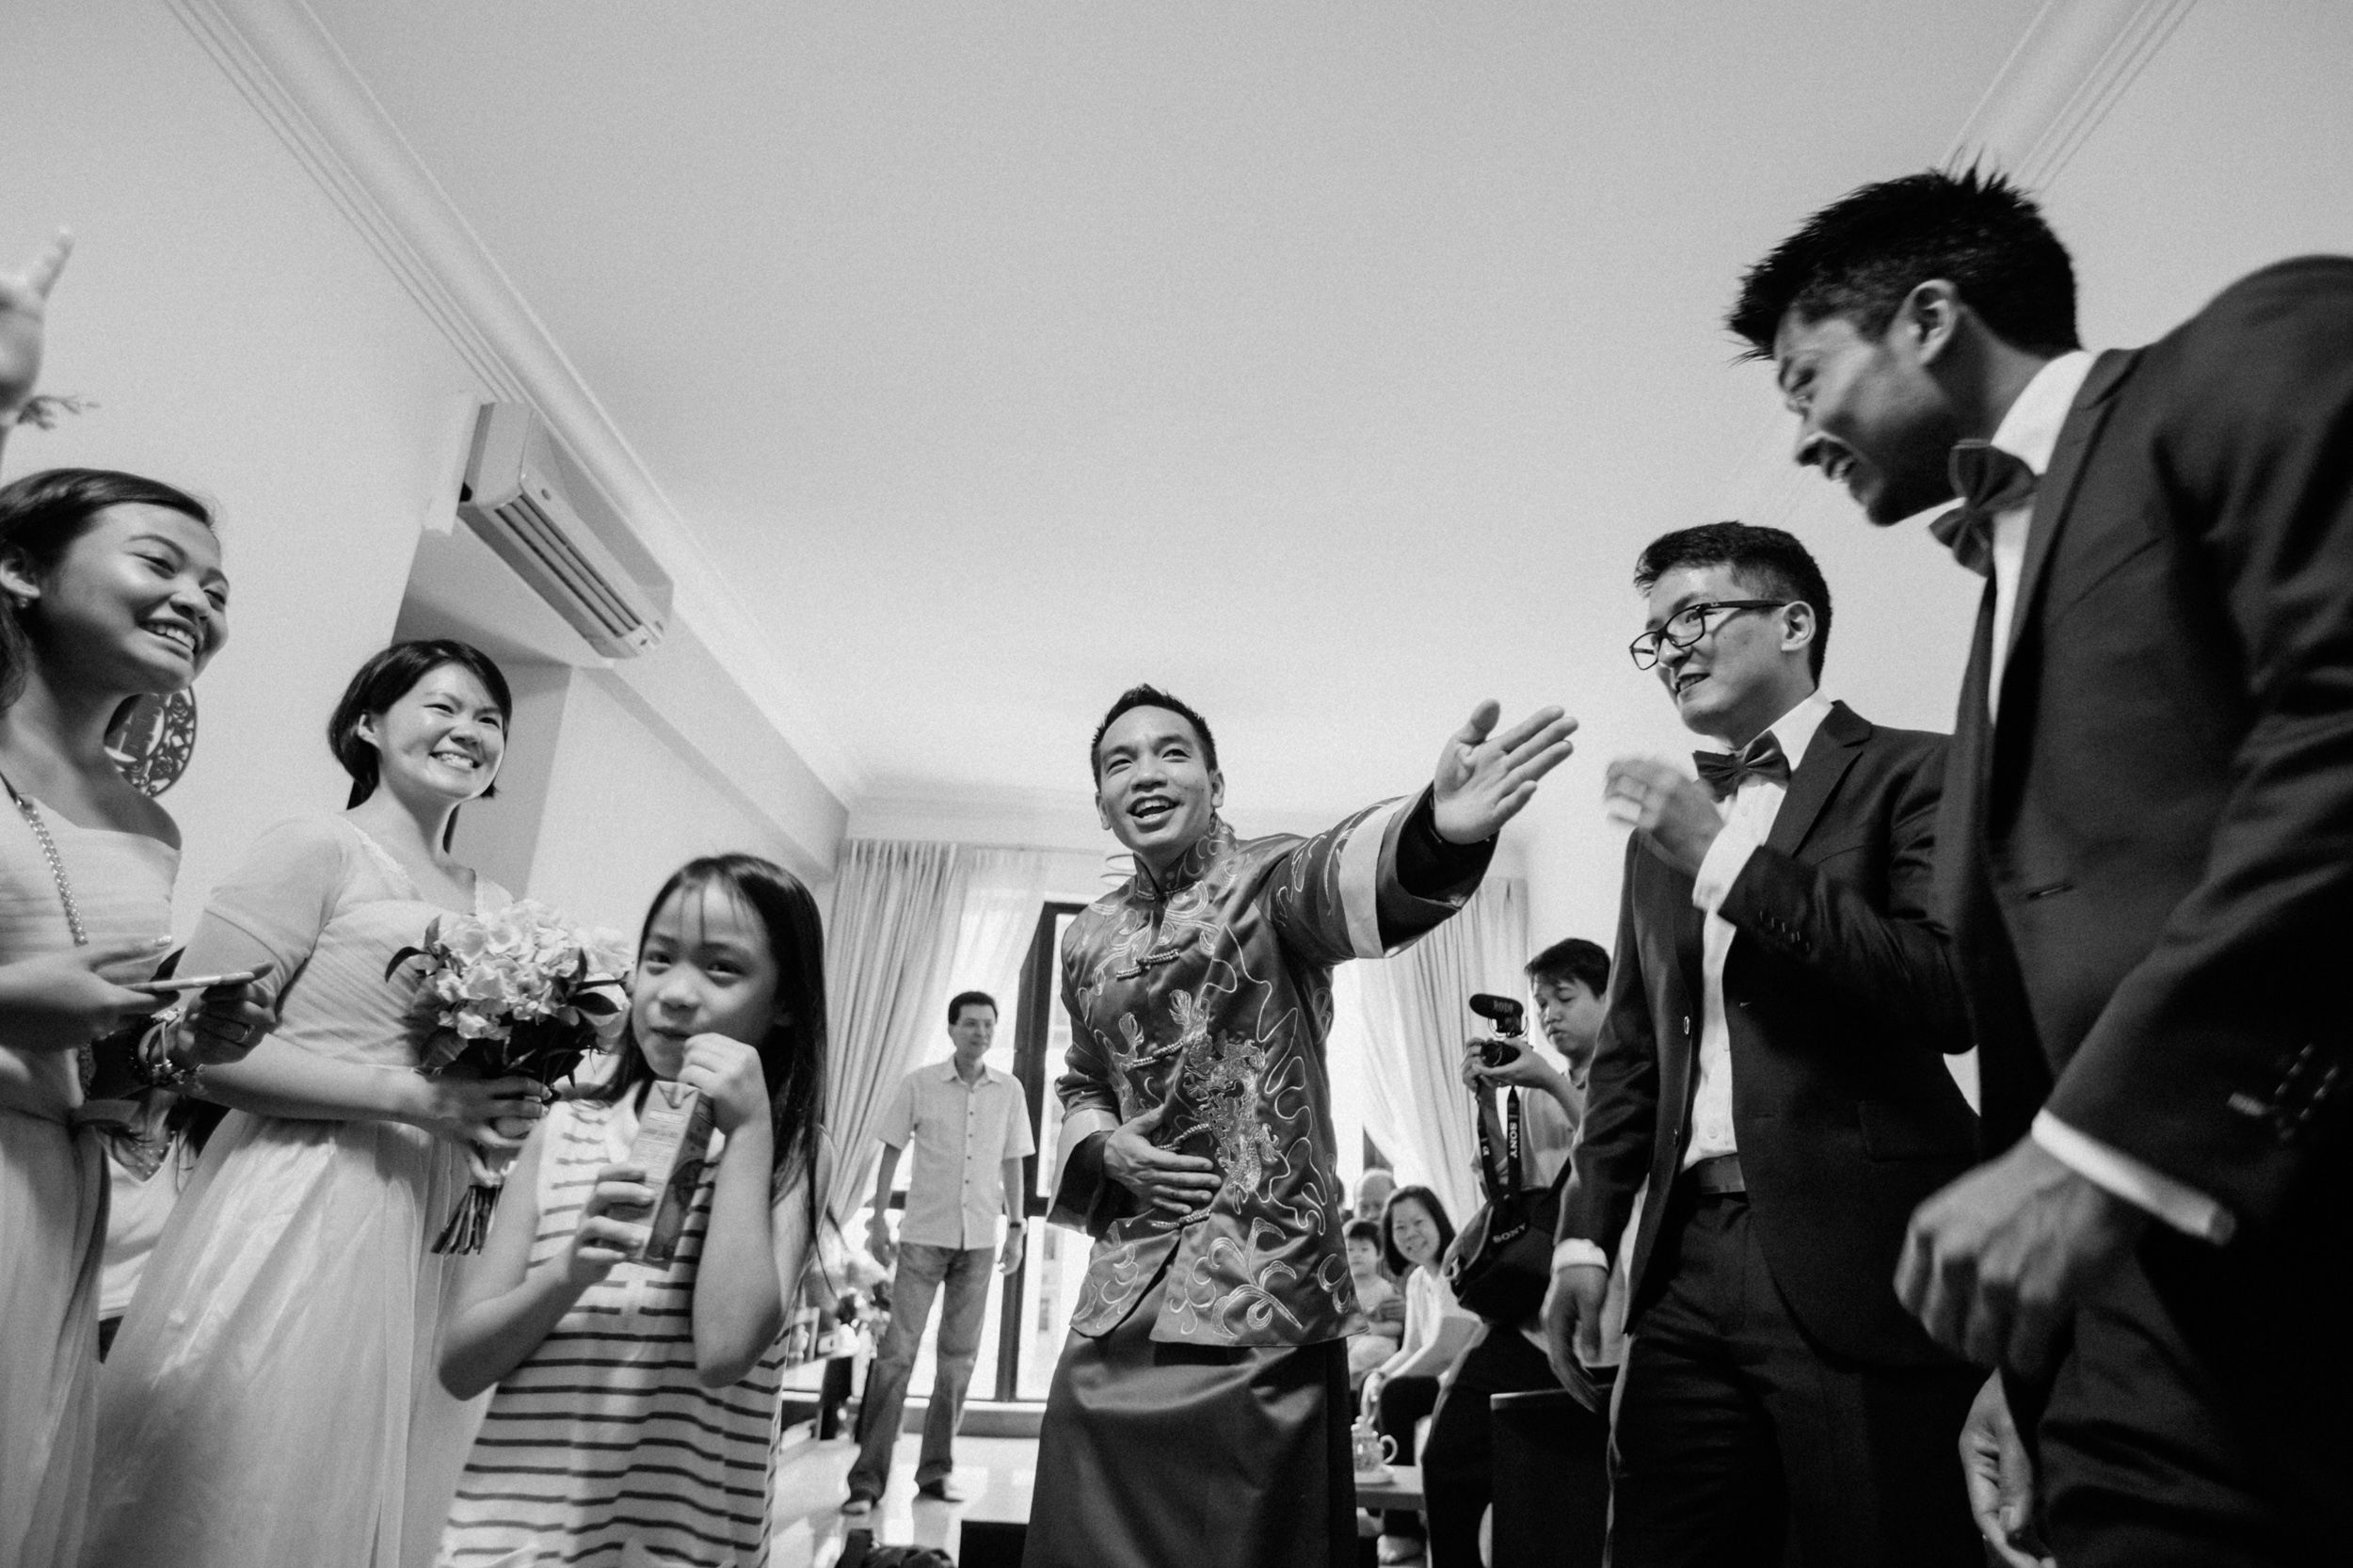 singapore-wedding-photographer-cheryl-matthew-fullerton-hotel-wedding-18.jpg